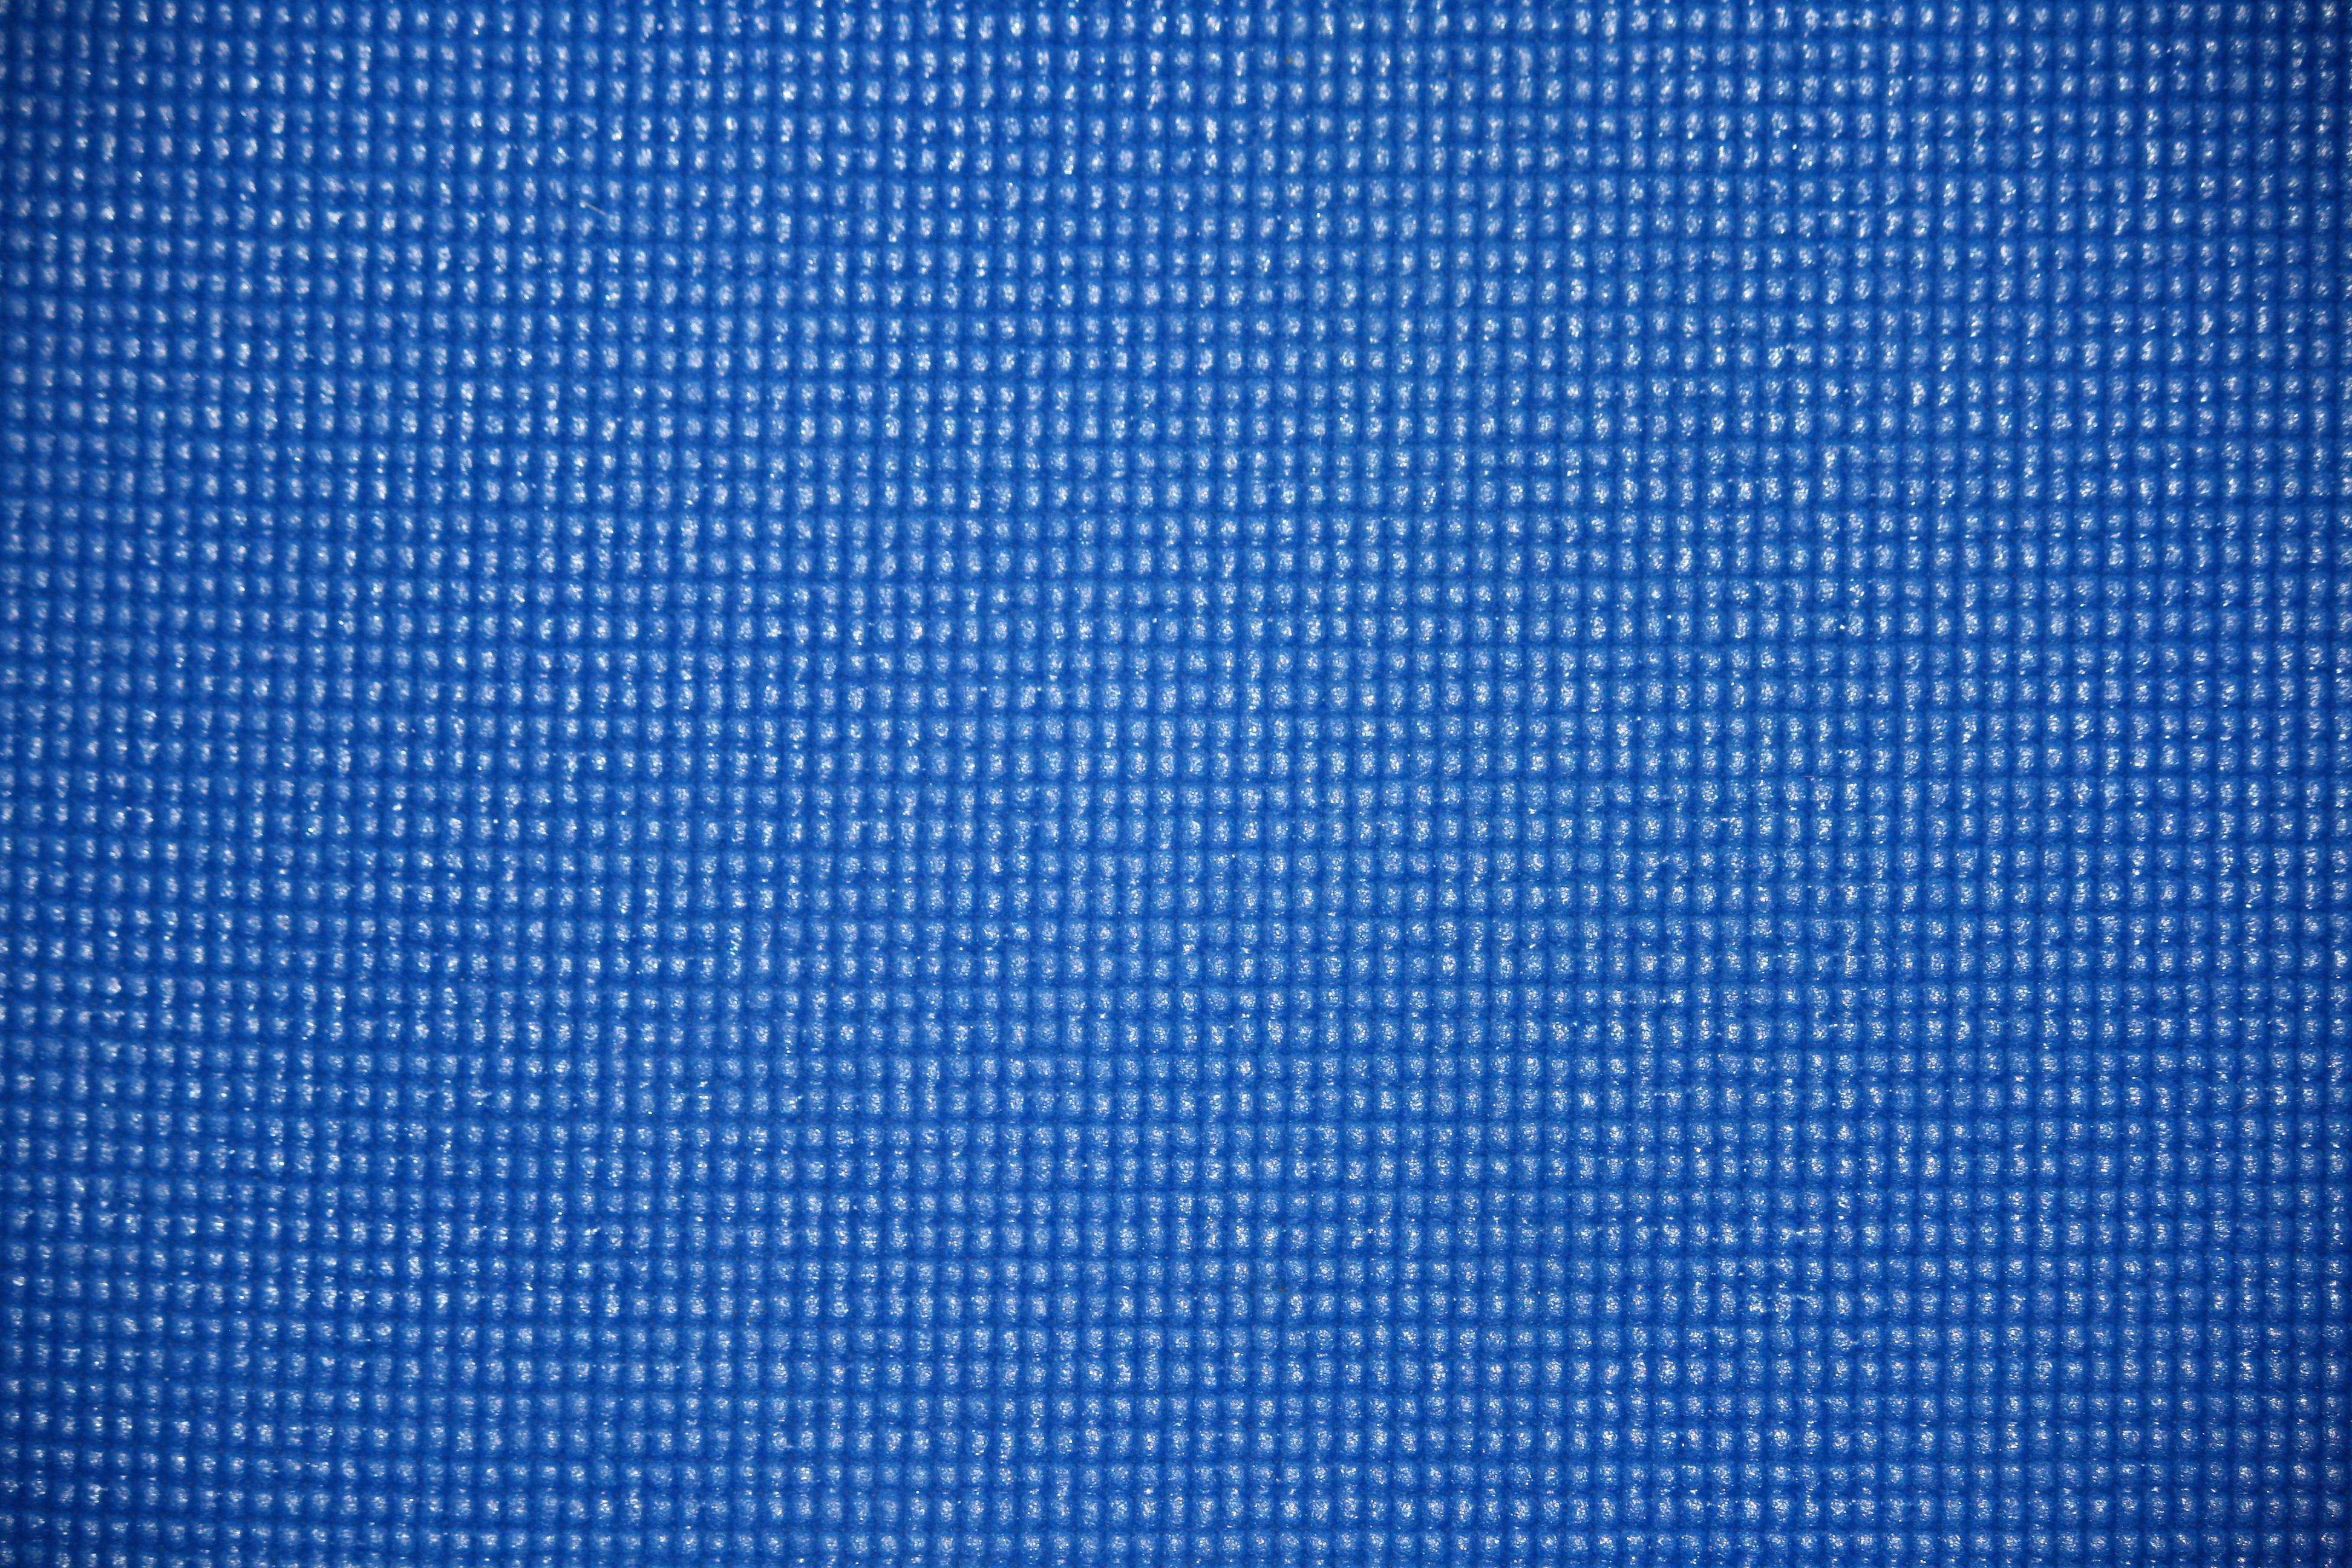 Blue Yoga Exercise Mat Texture Photos Public Domain